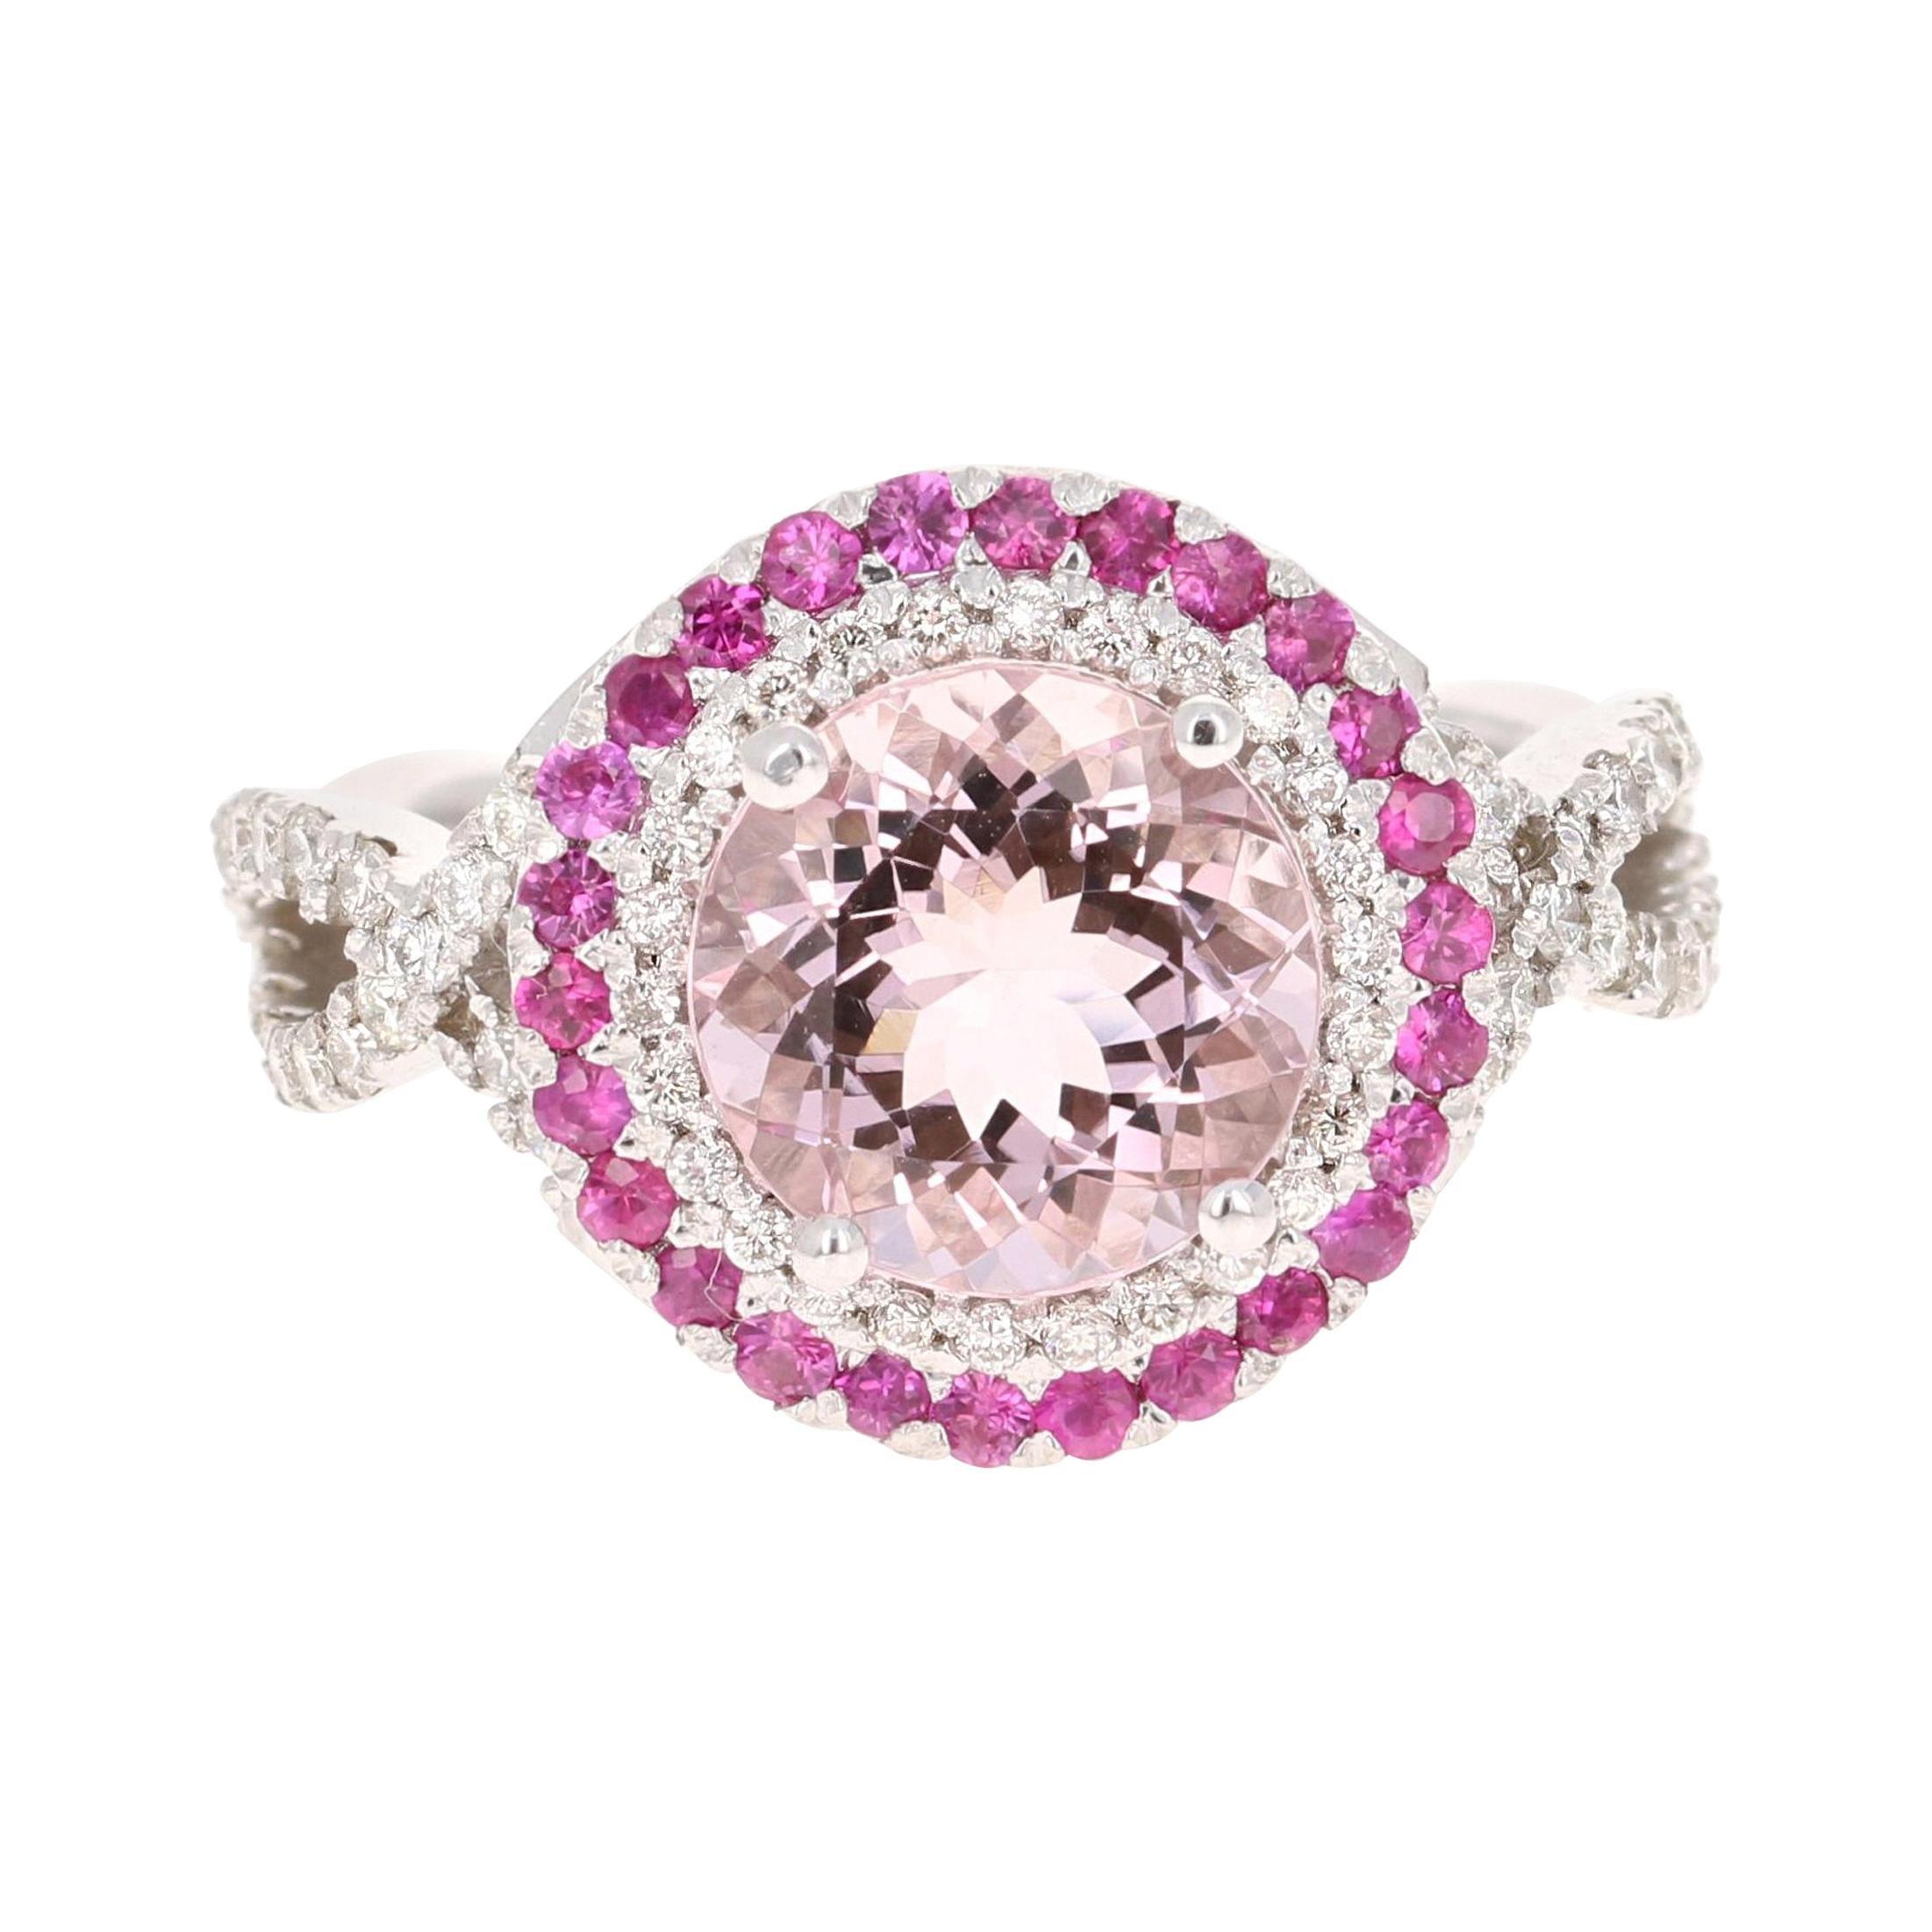 3.45 Carat Pink Morganite, Pink Sapphire and Diamond White Gold Engagement Ring